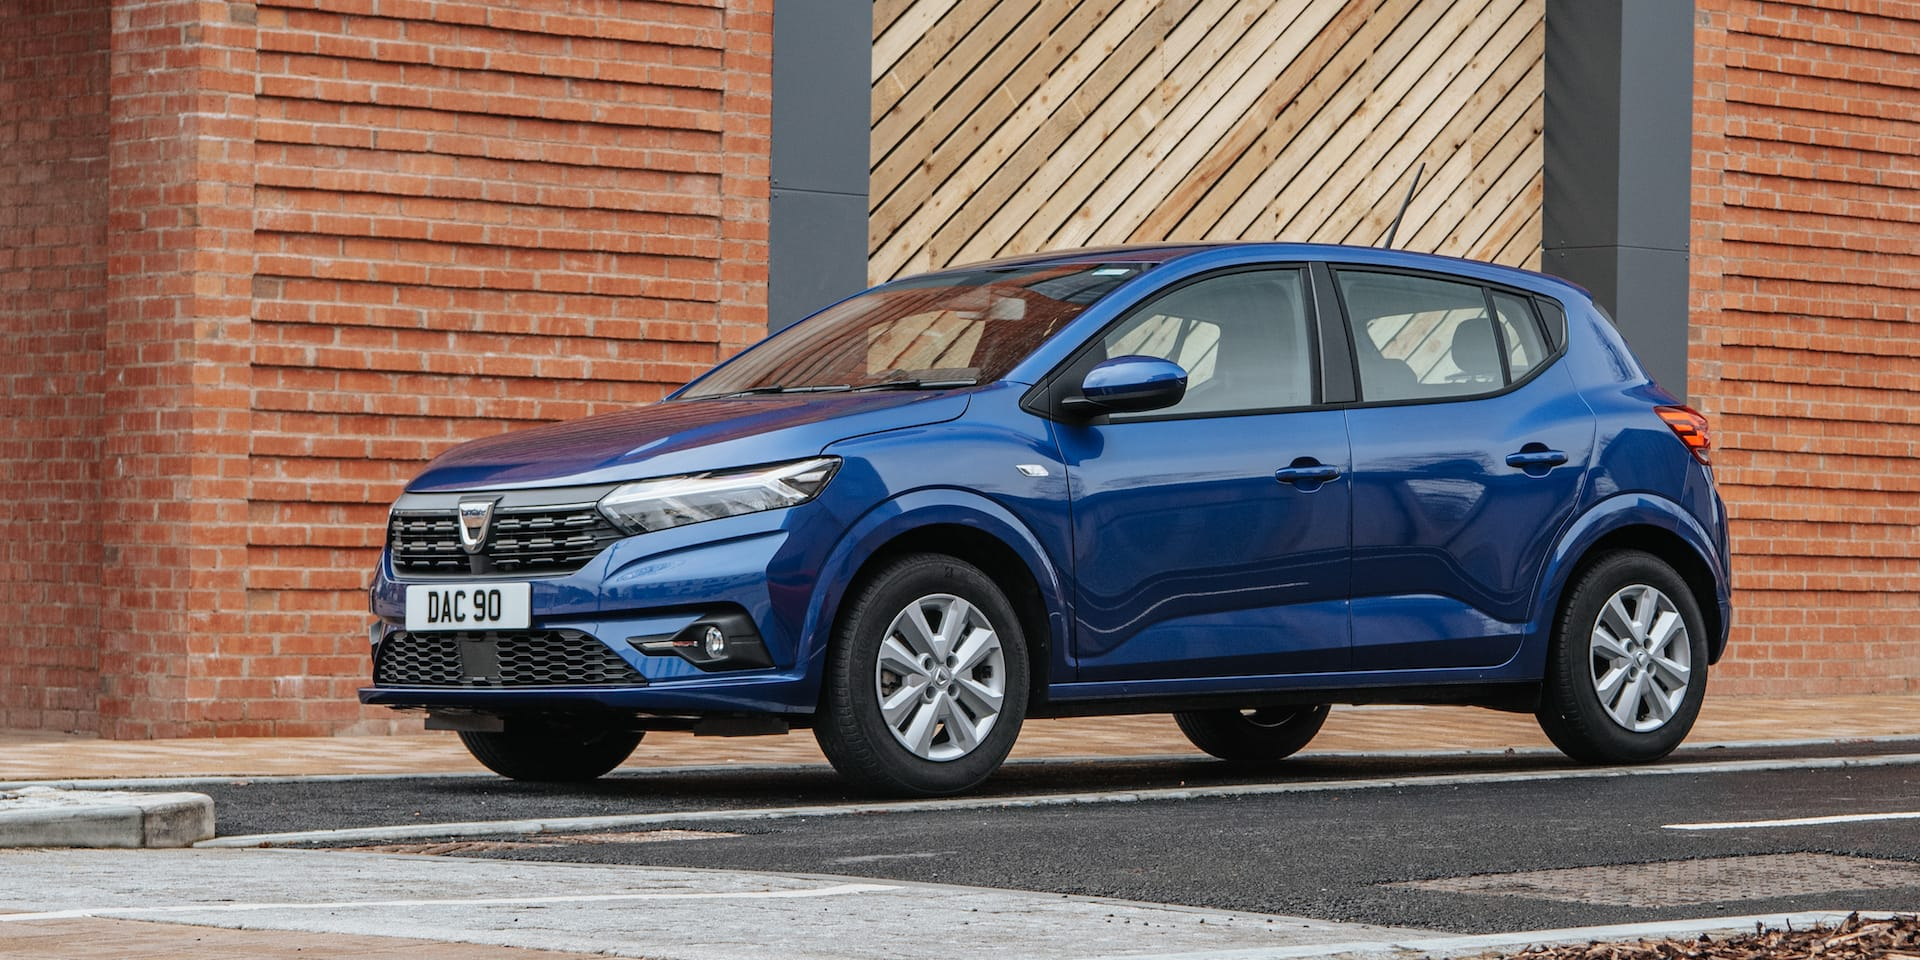 Dacia Sandero (2021 onwards) – Expert Rating